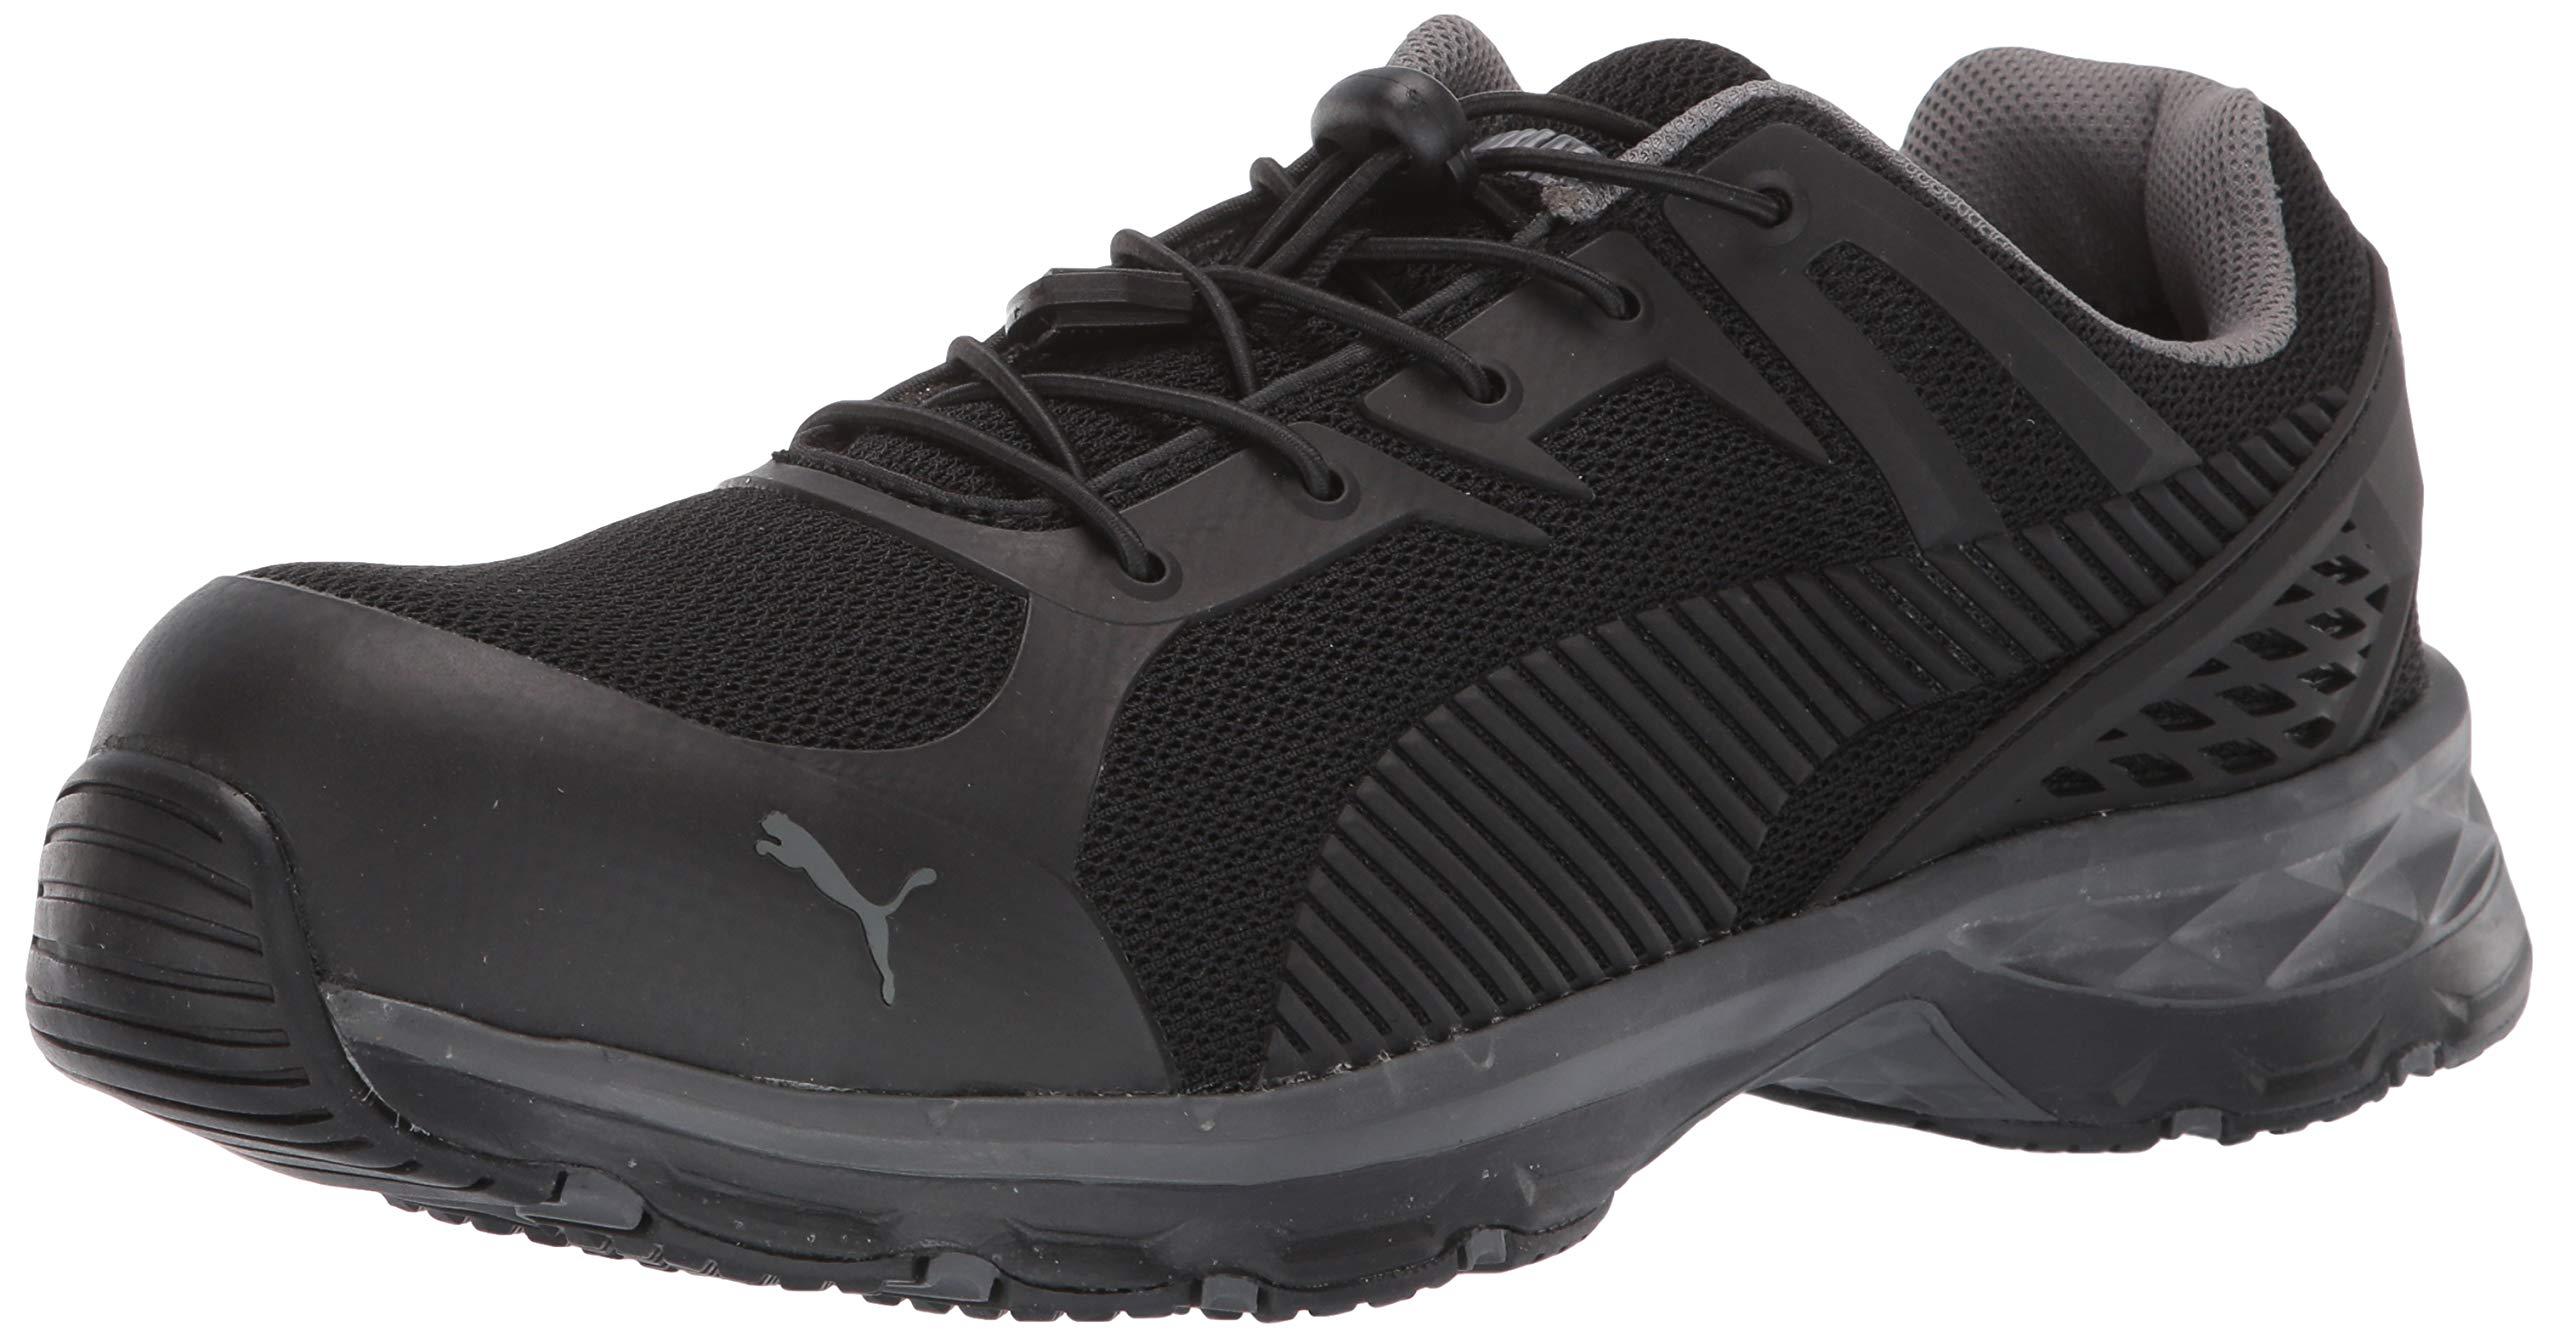 PUMA Men's Motion 2.0 SD Composite Toe Sneaker